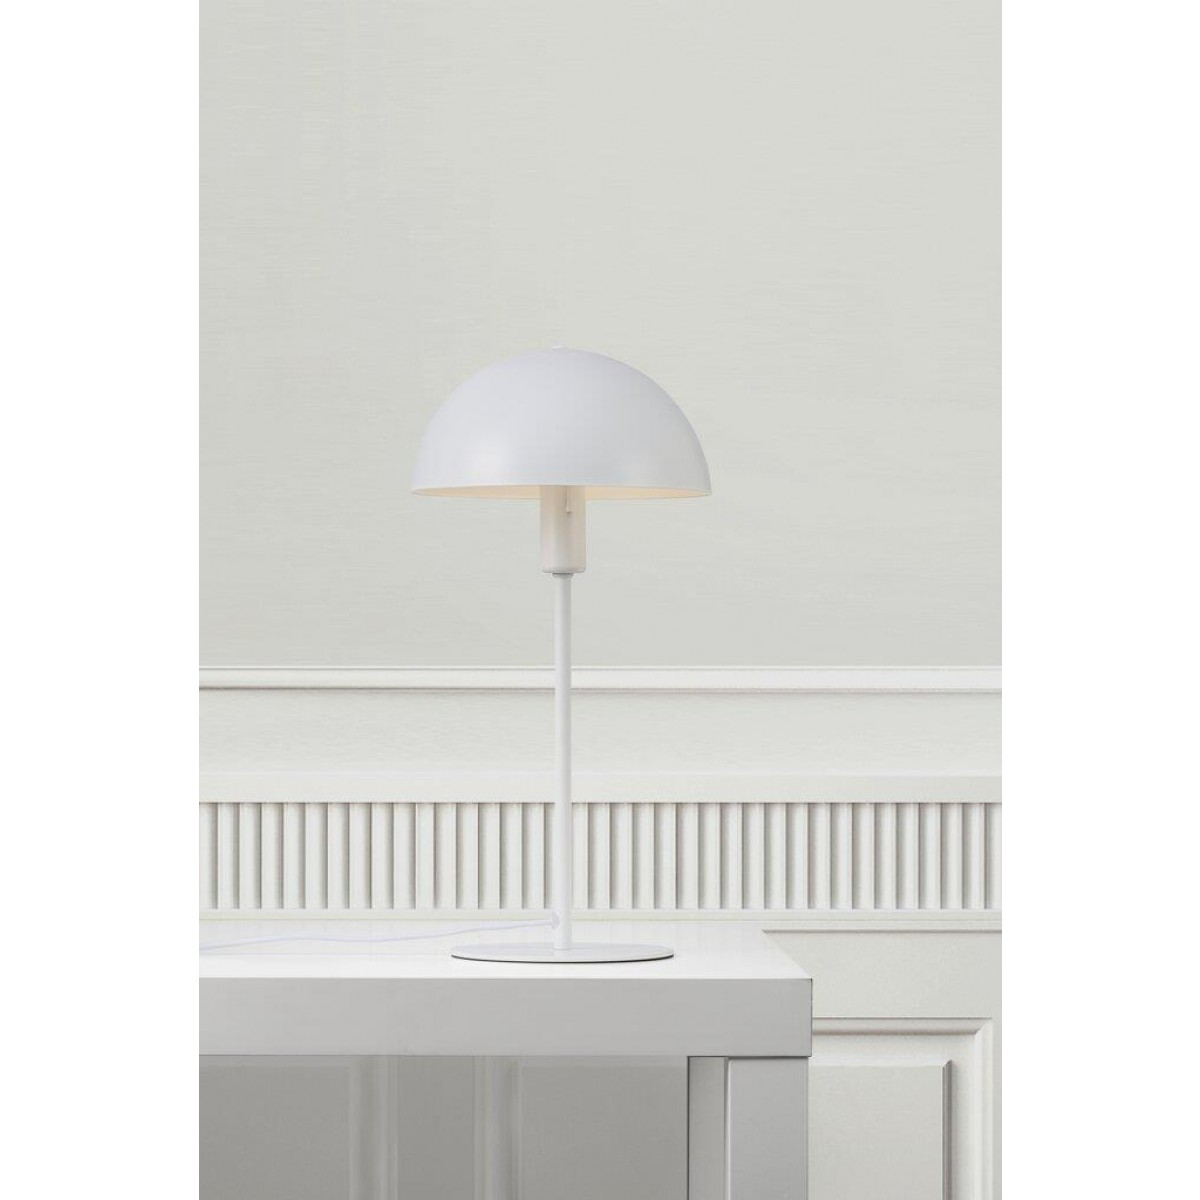 NORDLUXBordlampeellenhvid-05